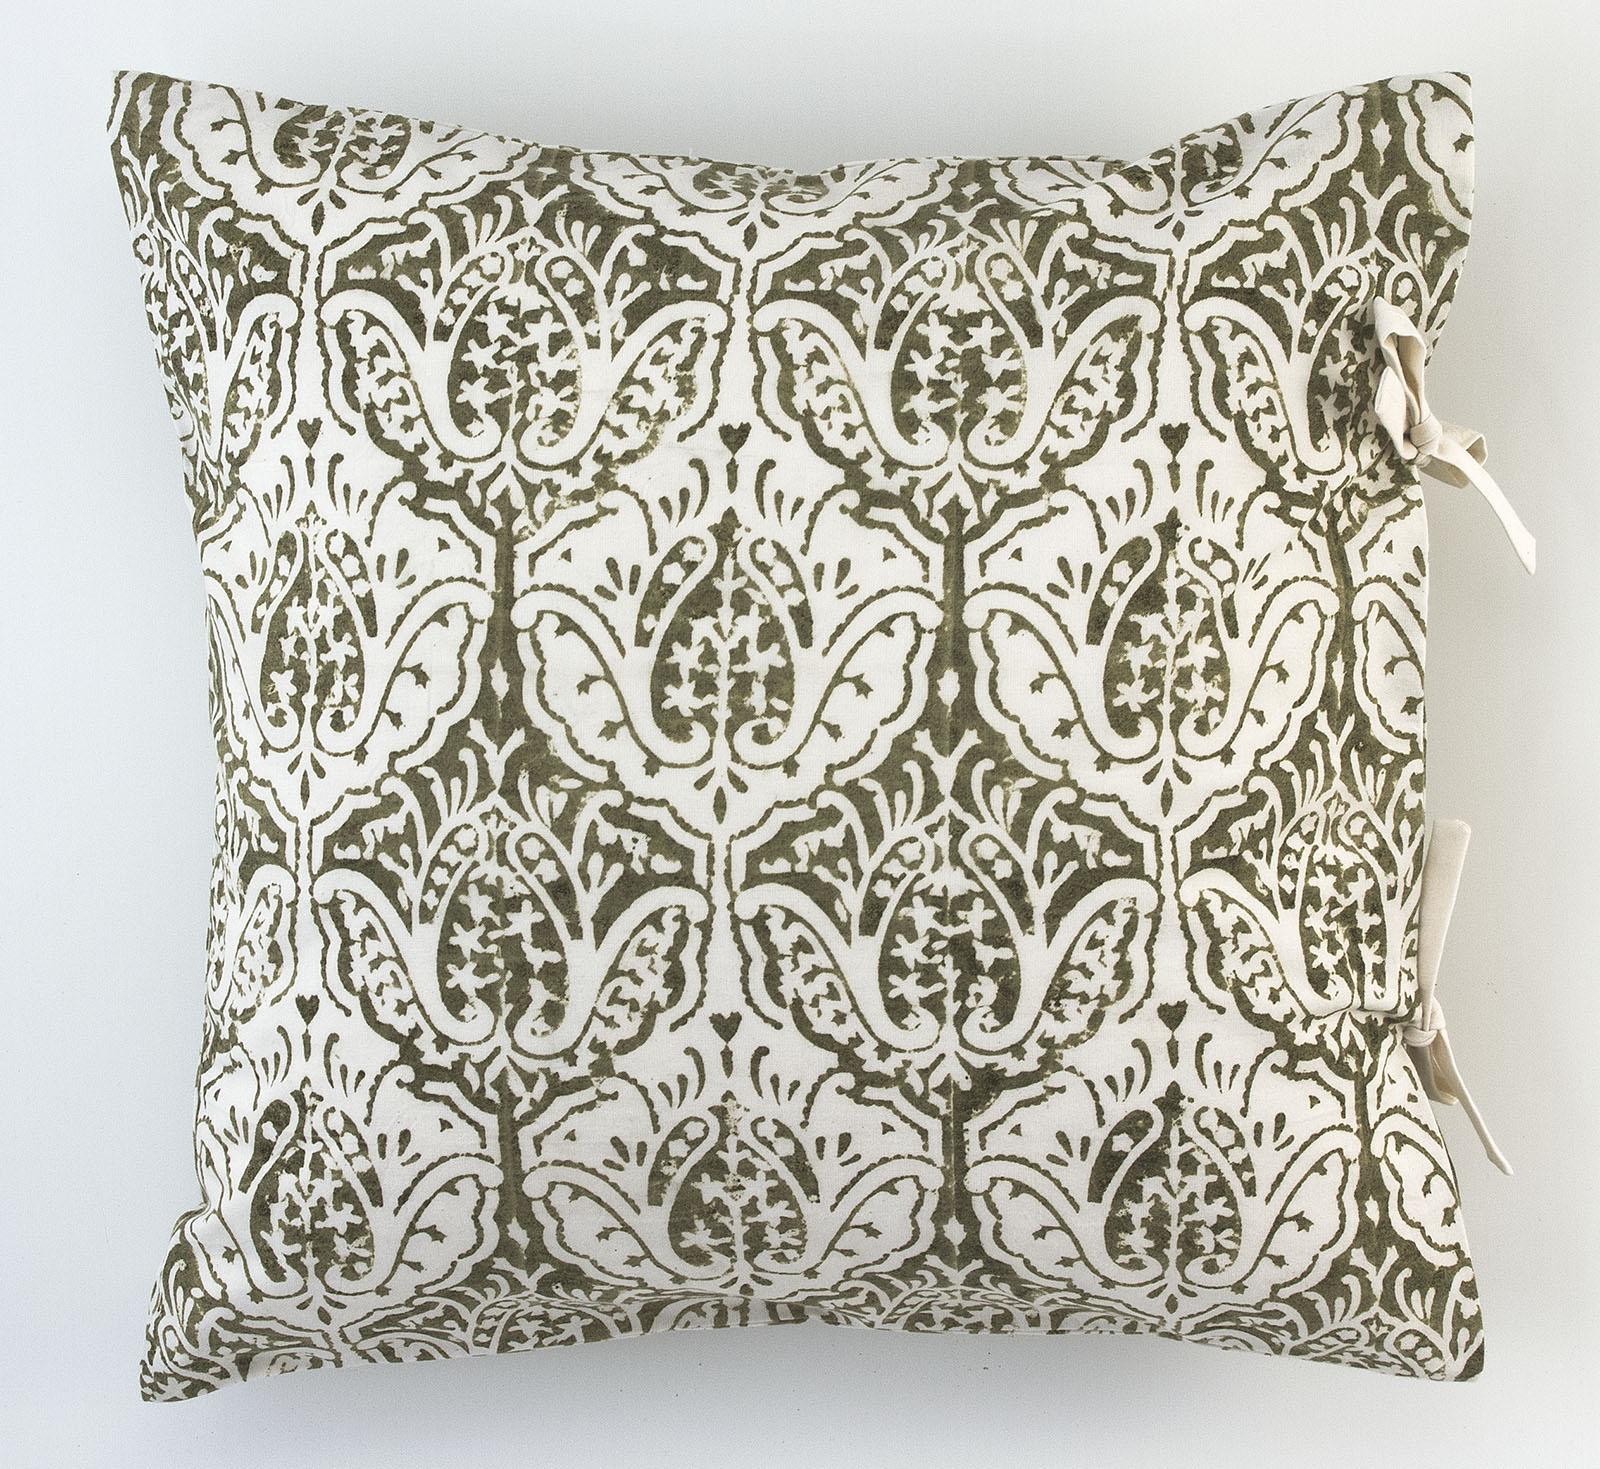 dominique small deco pillow les indiennes. Black Bedroom Furniture Sets. Home Design Ideas